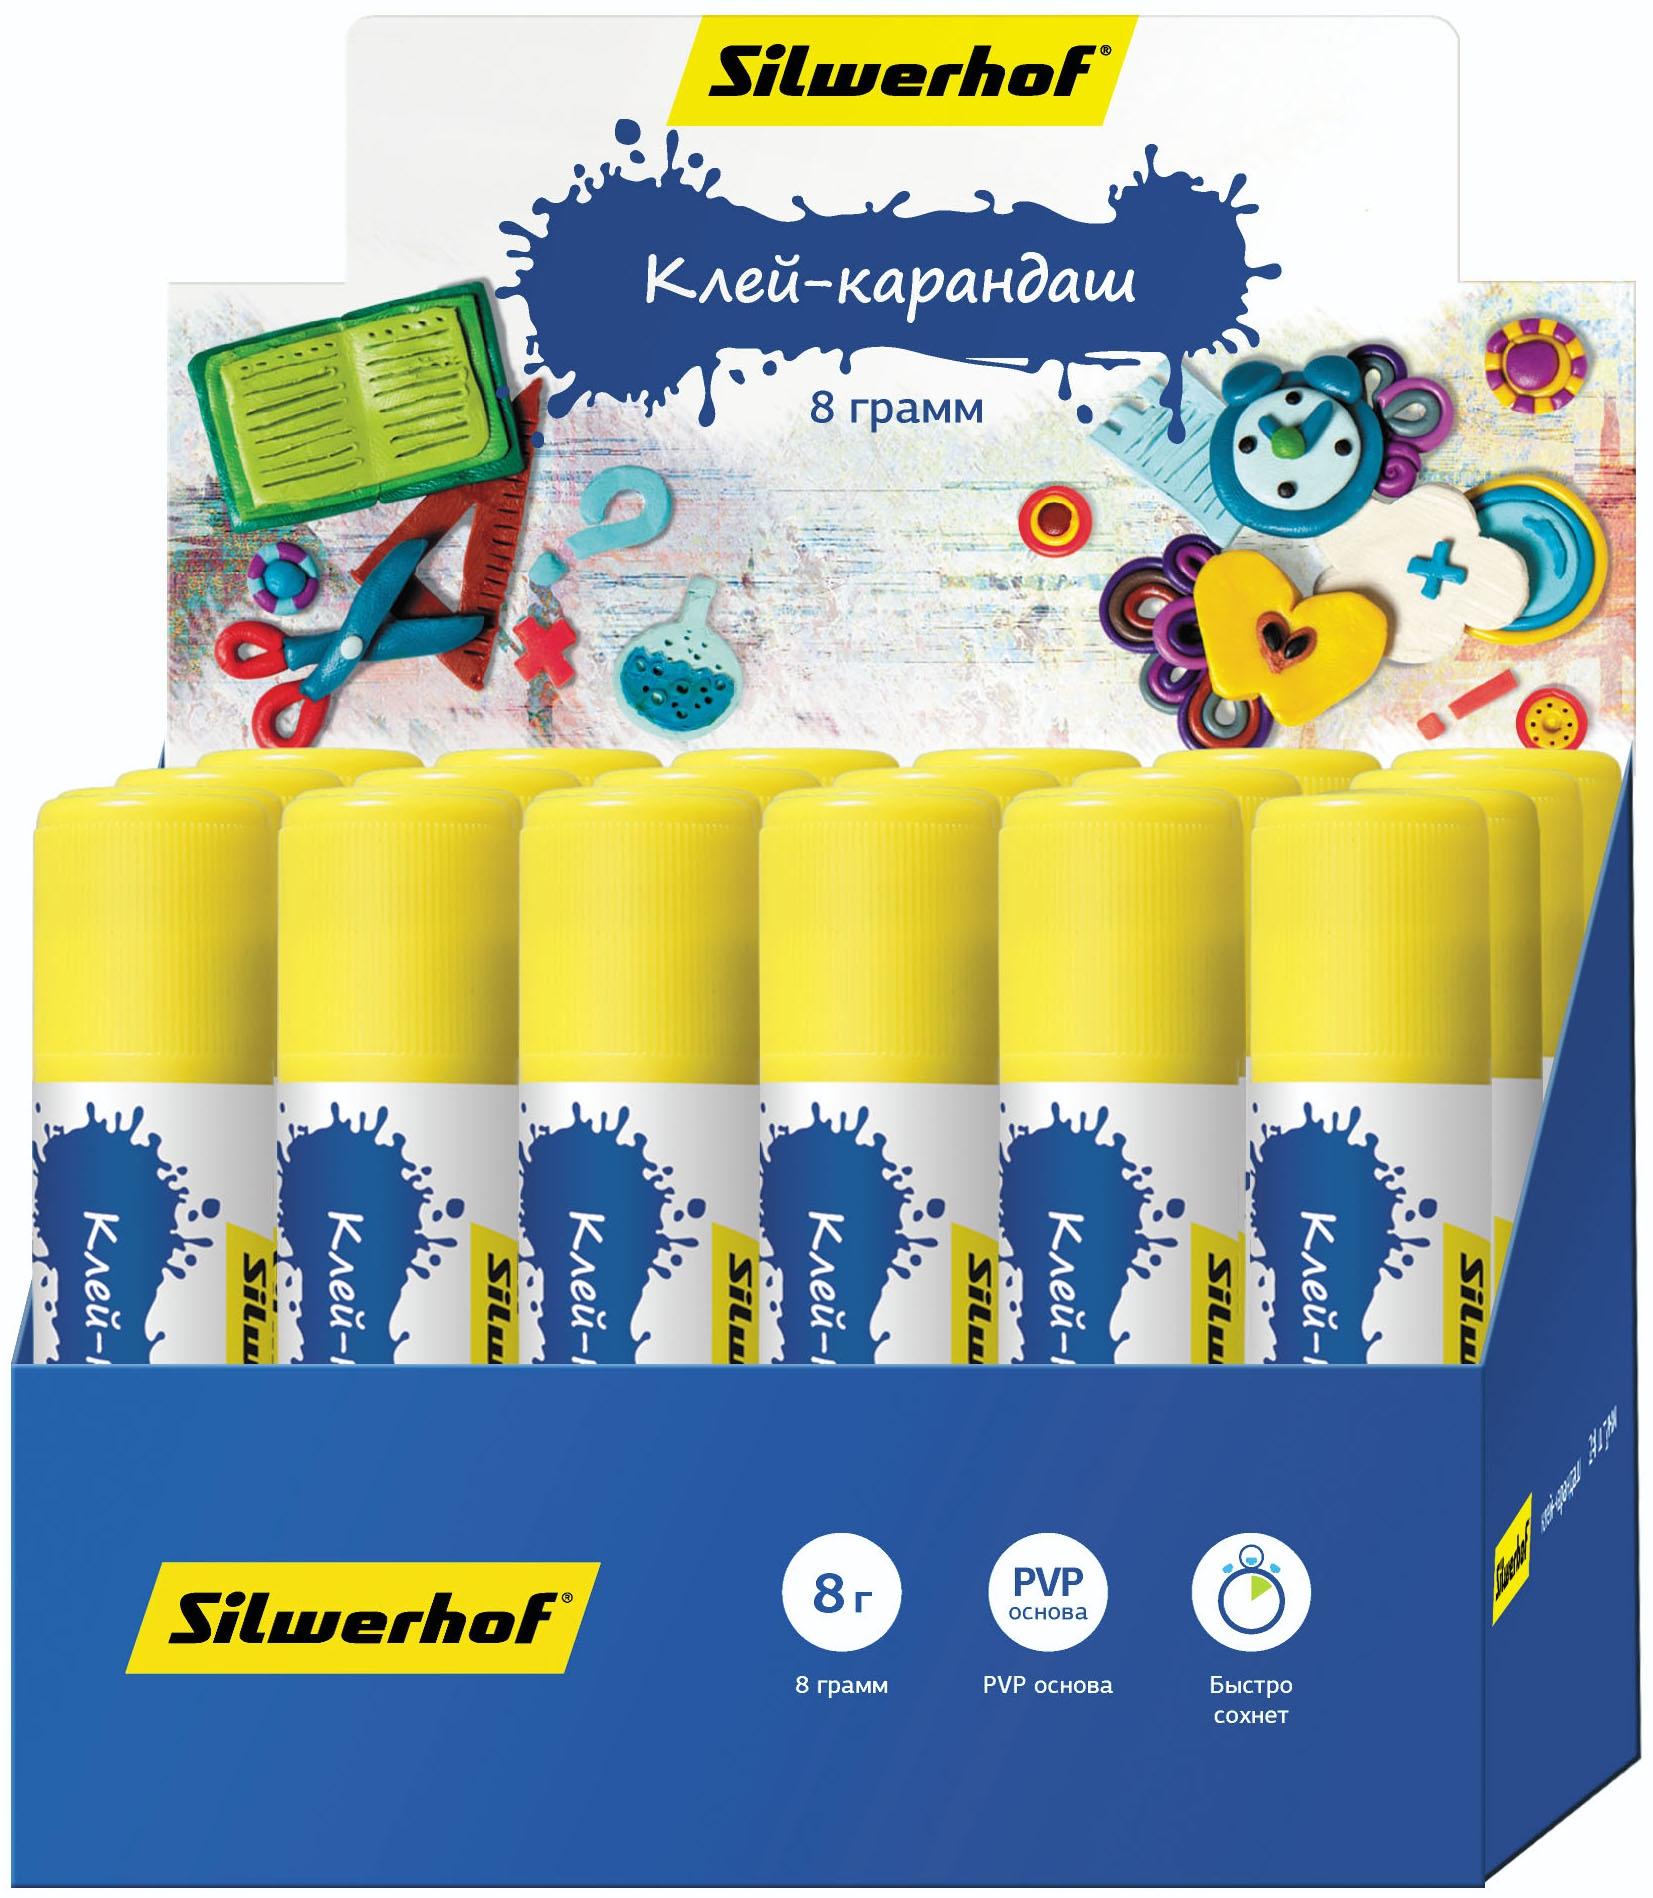 цена на Клей-карандаш Silwerhof Пластилиновая коллекция 8 г